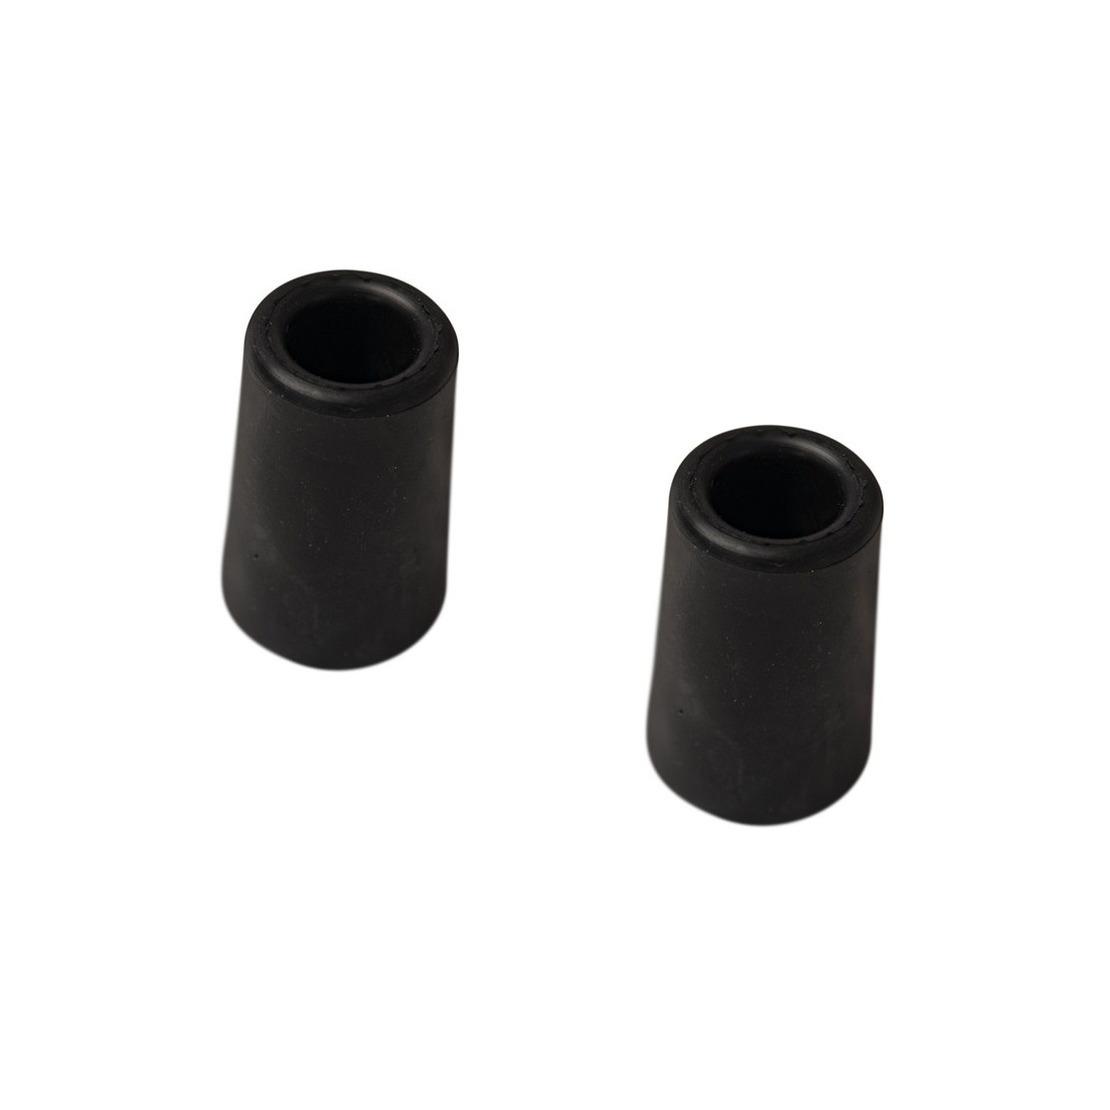 4x stuks deurstopper - deurbuffer rubber zwart 60 mm